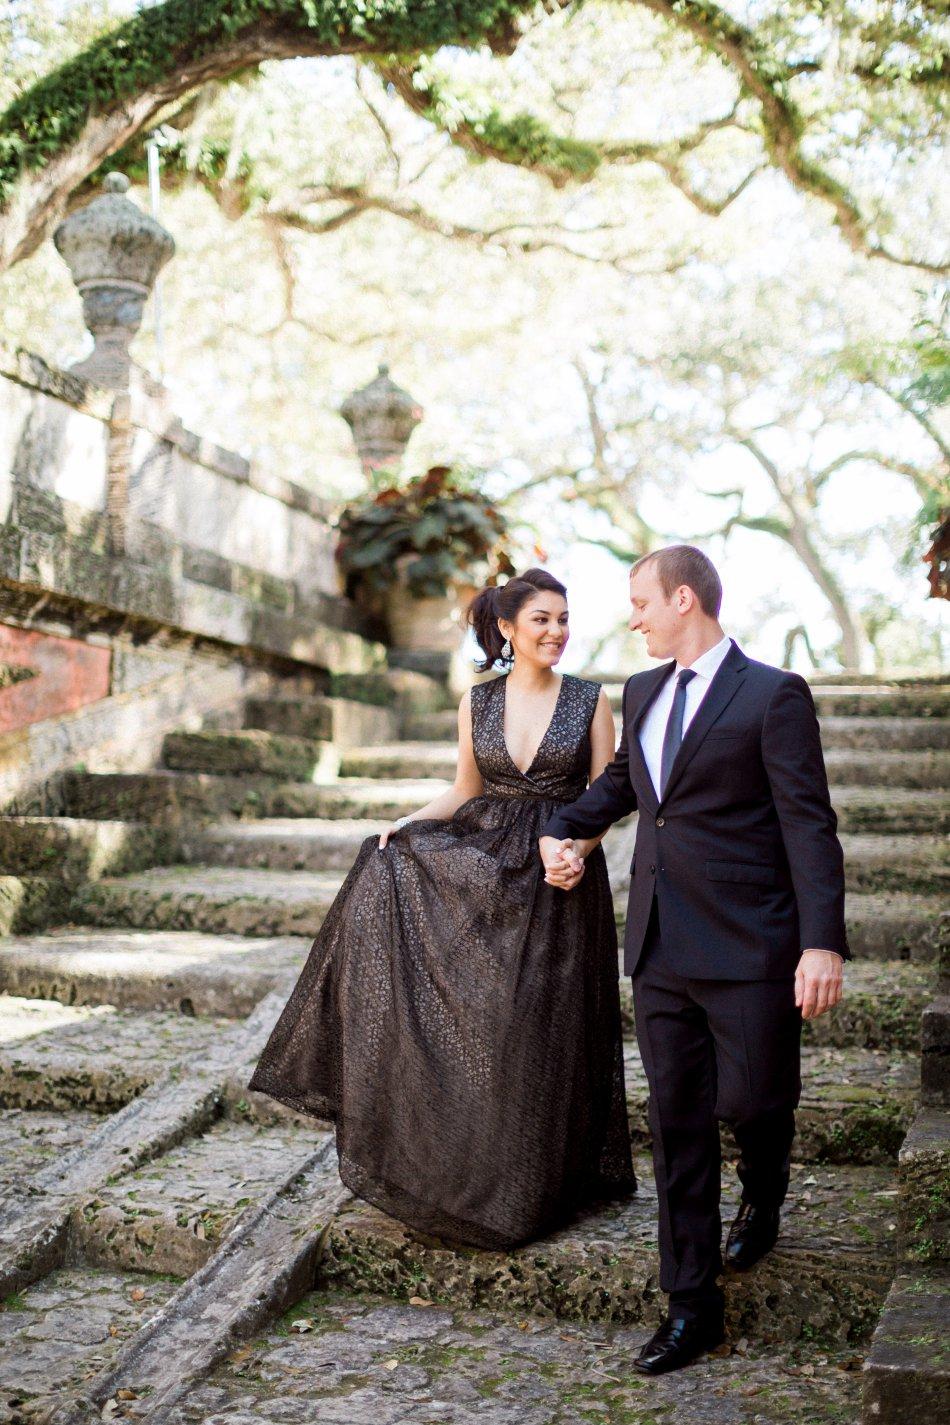 vizcaya-miami-wedding-photographer-florida-luxury-engagement_0354.jpg